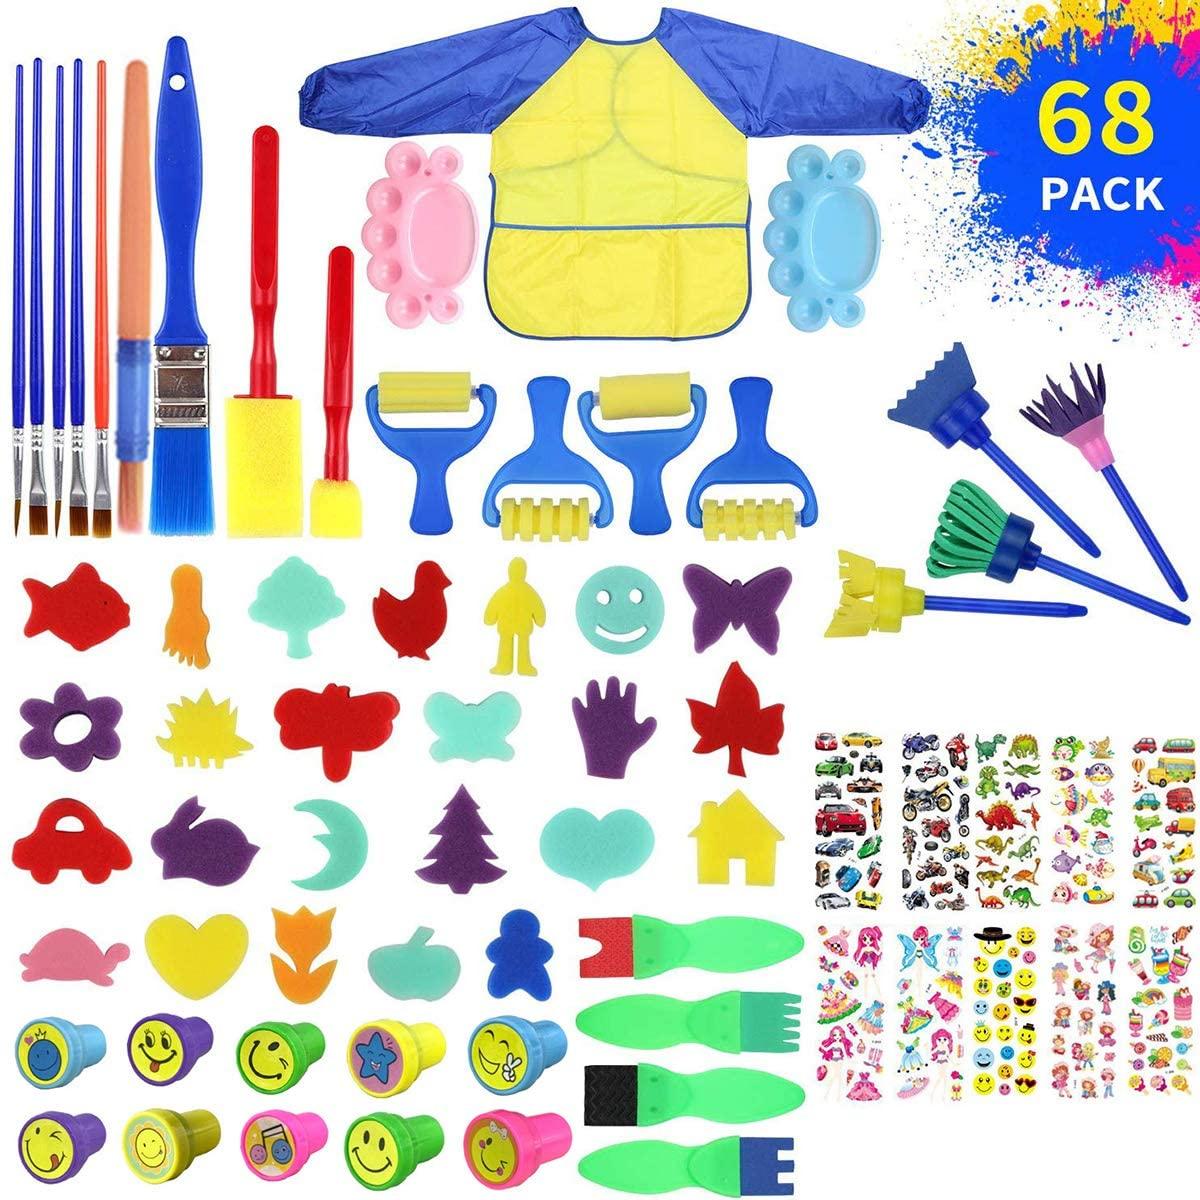 SunshineFace 68pcs/lot Kids Sponge Painting Brushes Set, Child Painting Brushes Stamps Stickers Long Sleeve Waterproof Apron Toys Gift